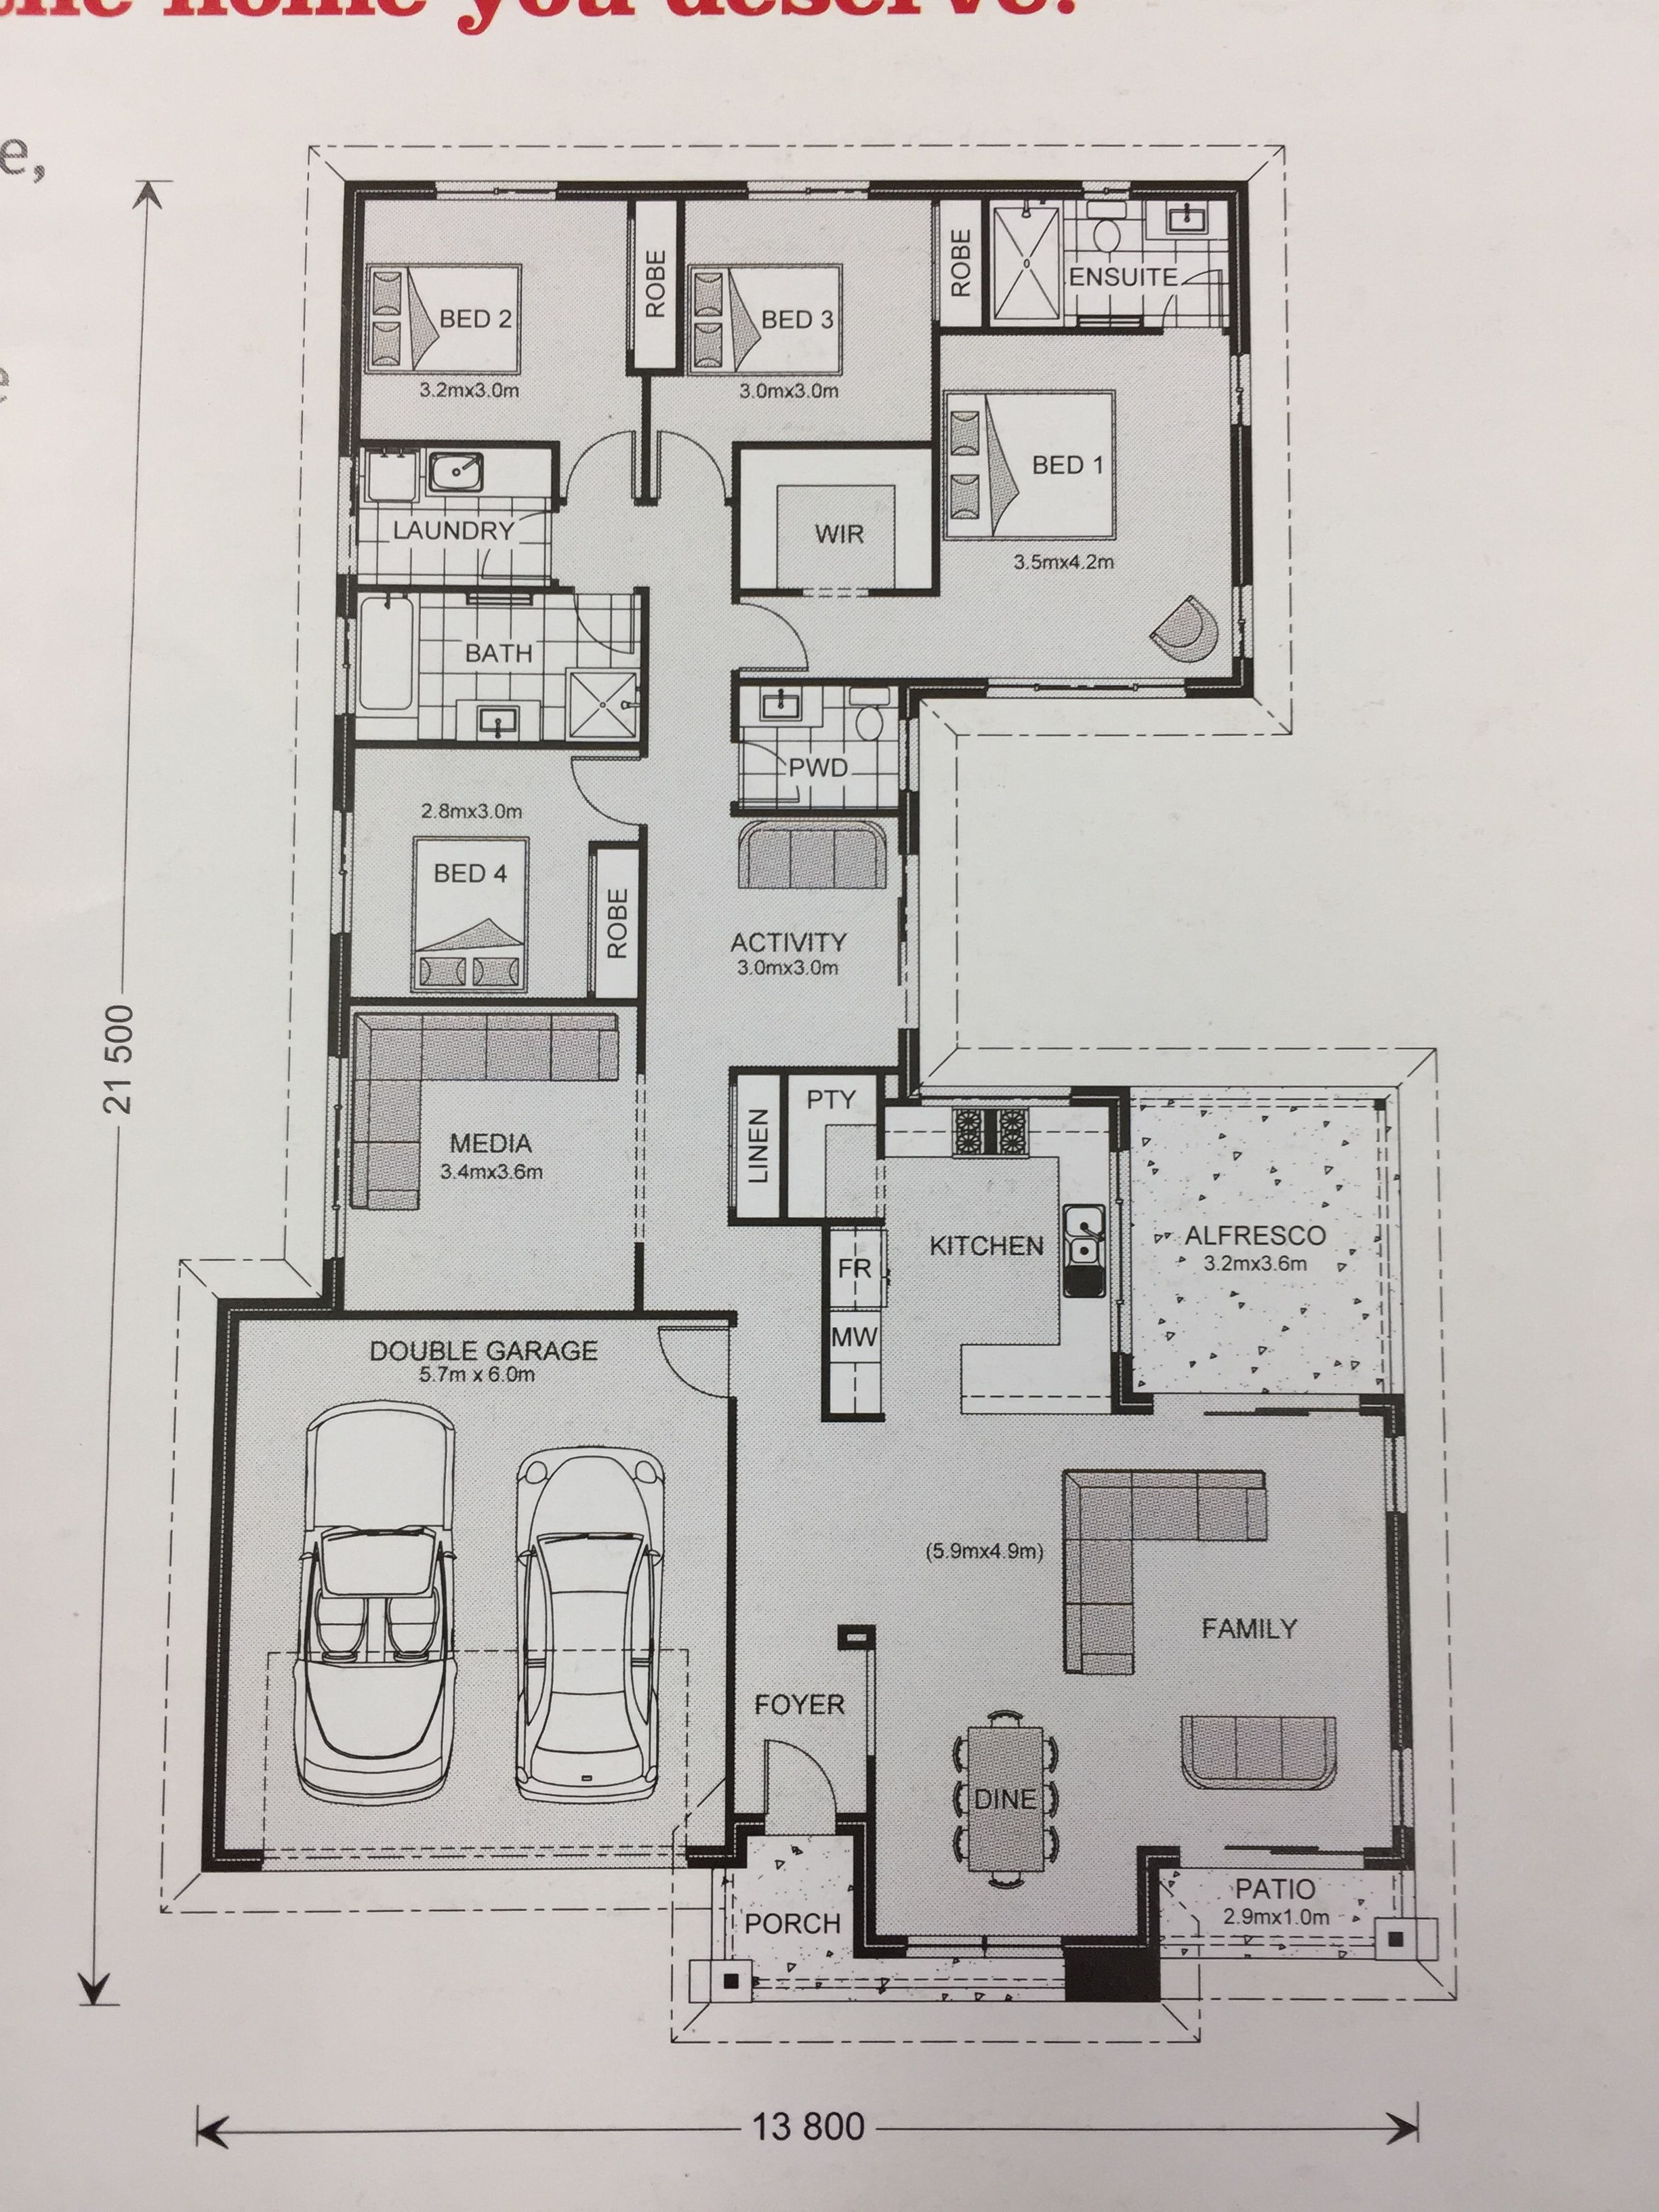 G J Gardner Homes Lakeview 234 House Plans Craftsman Floor Plans Modern House Design